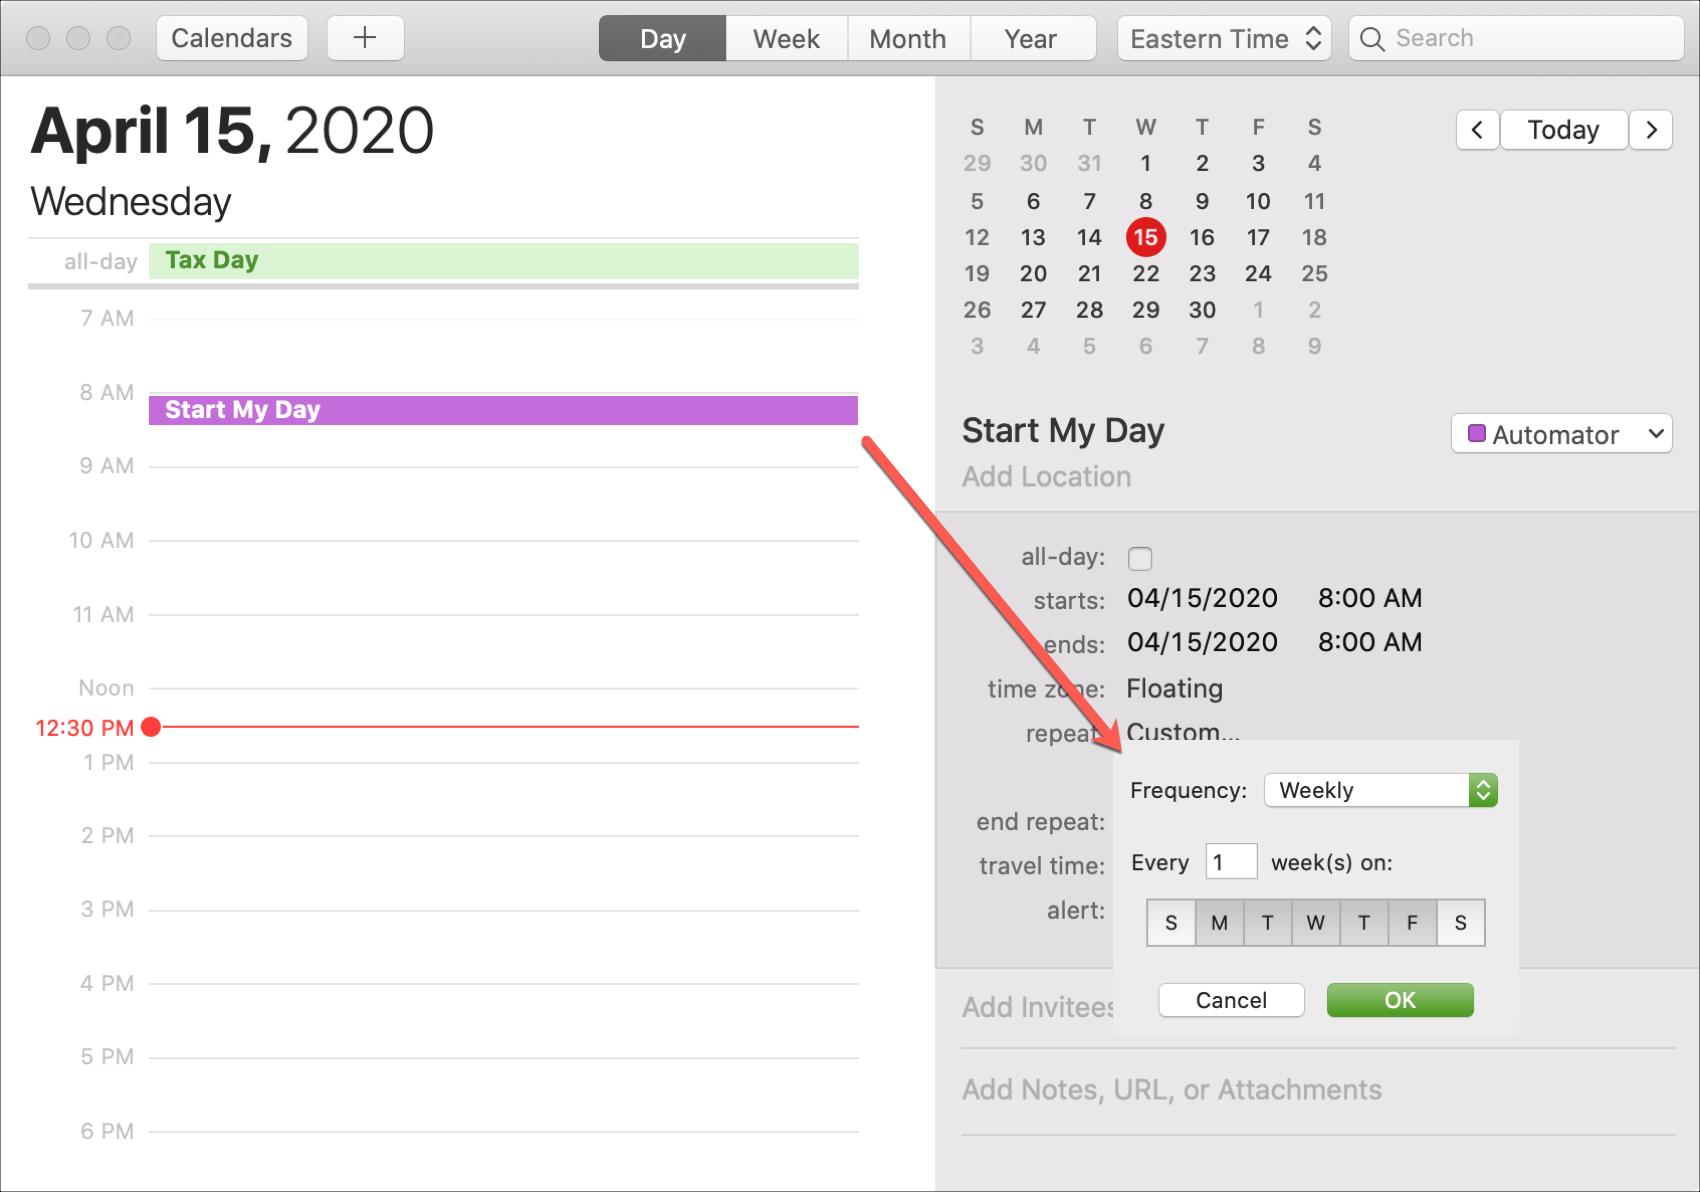 Repeat Event for Automator Calendar Alarm